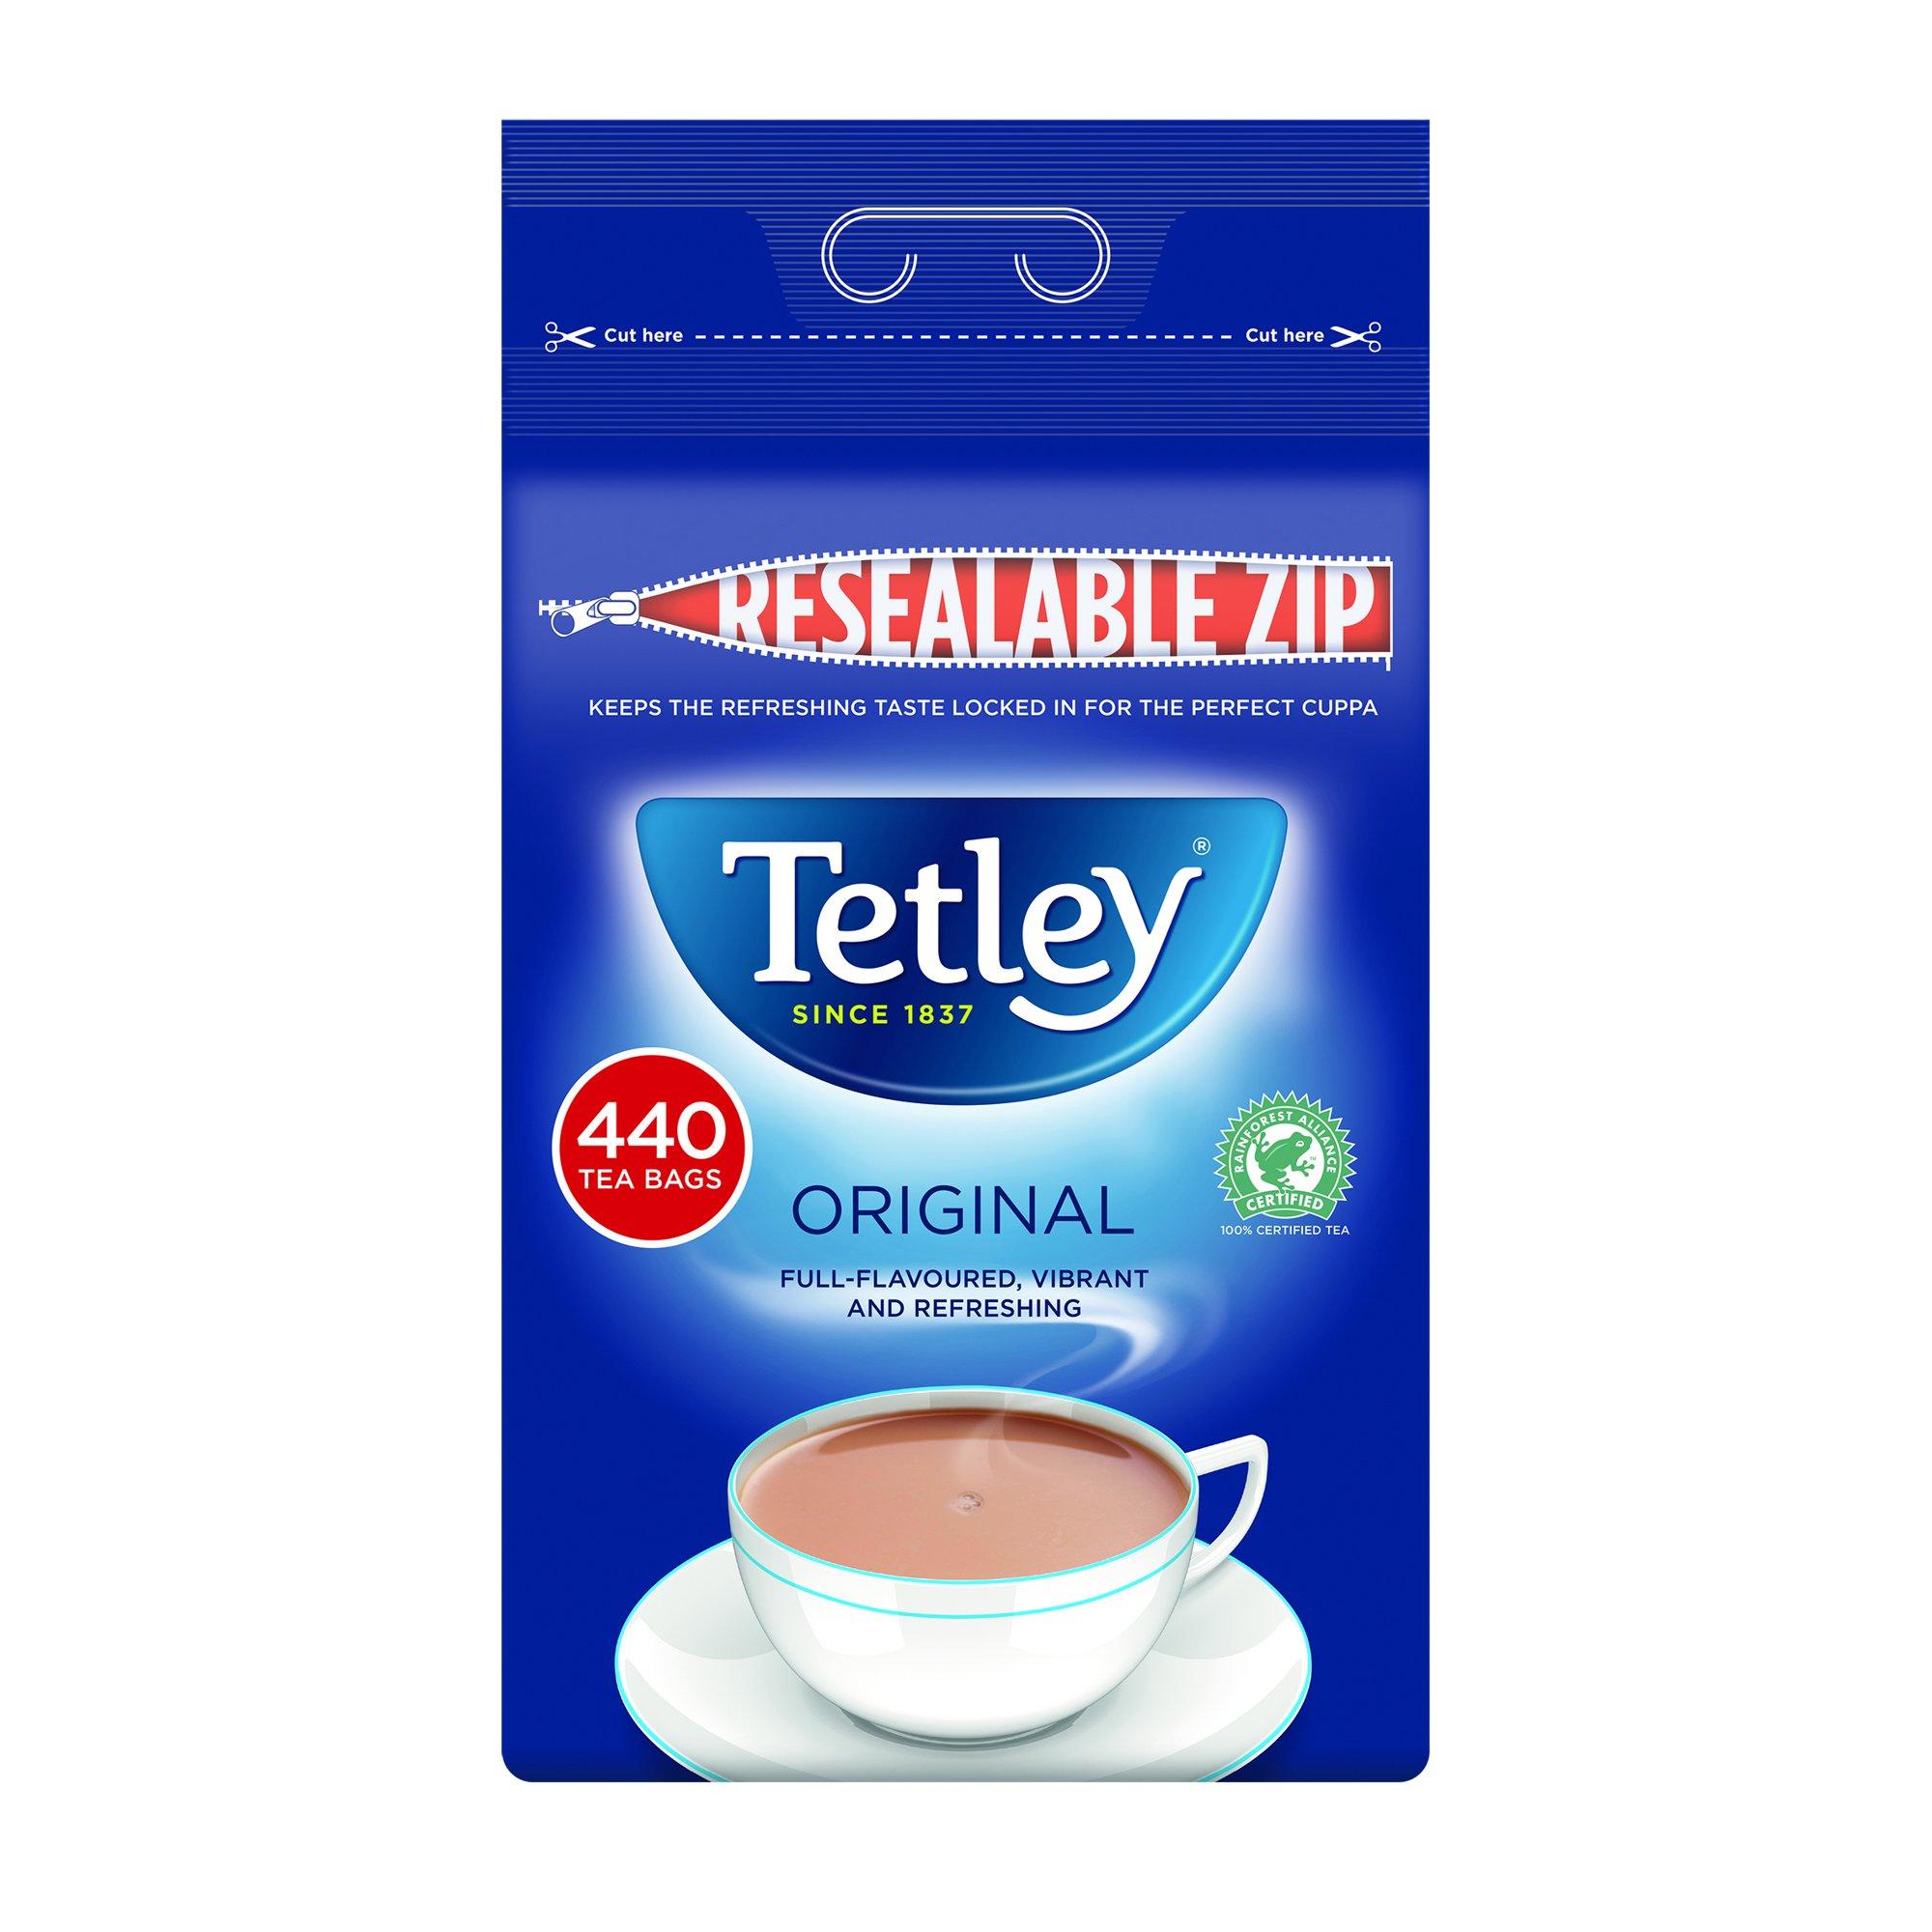 Tetley One Cup Tea Bags (440)